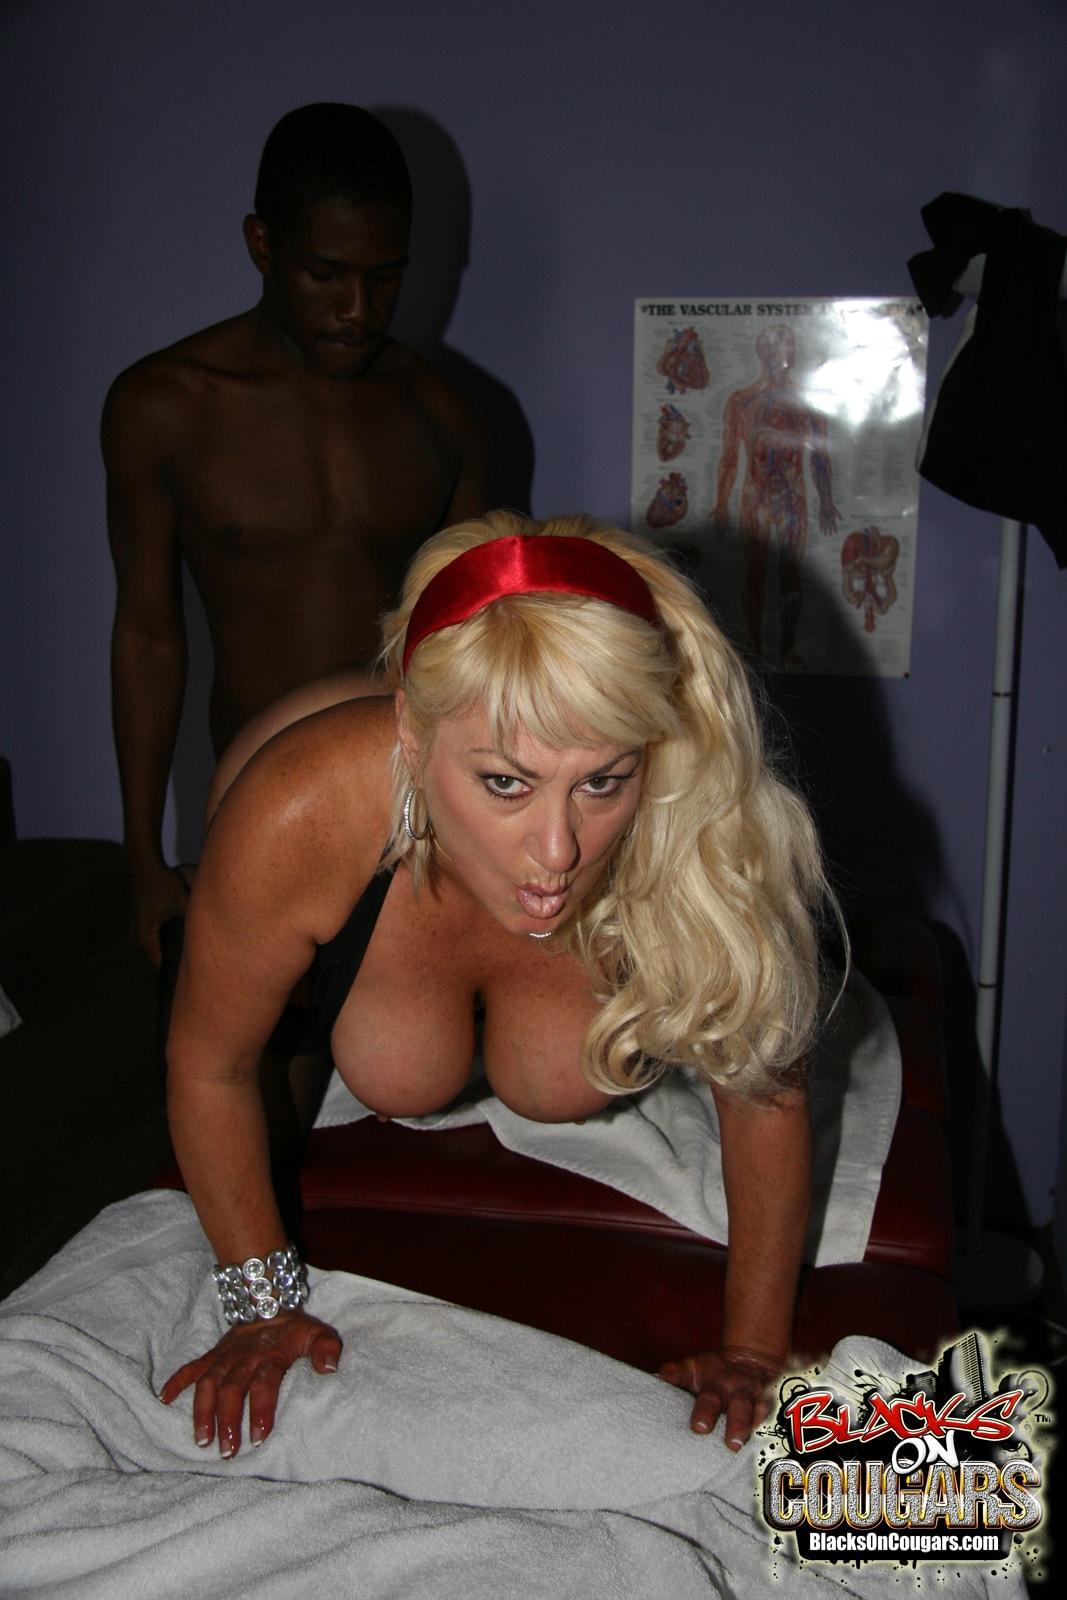 Dogfart '- Blacks On Cougars' starring Dana Hayes (Photo 18)